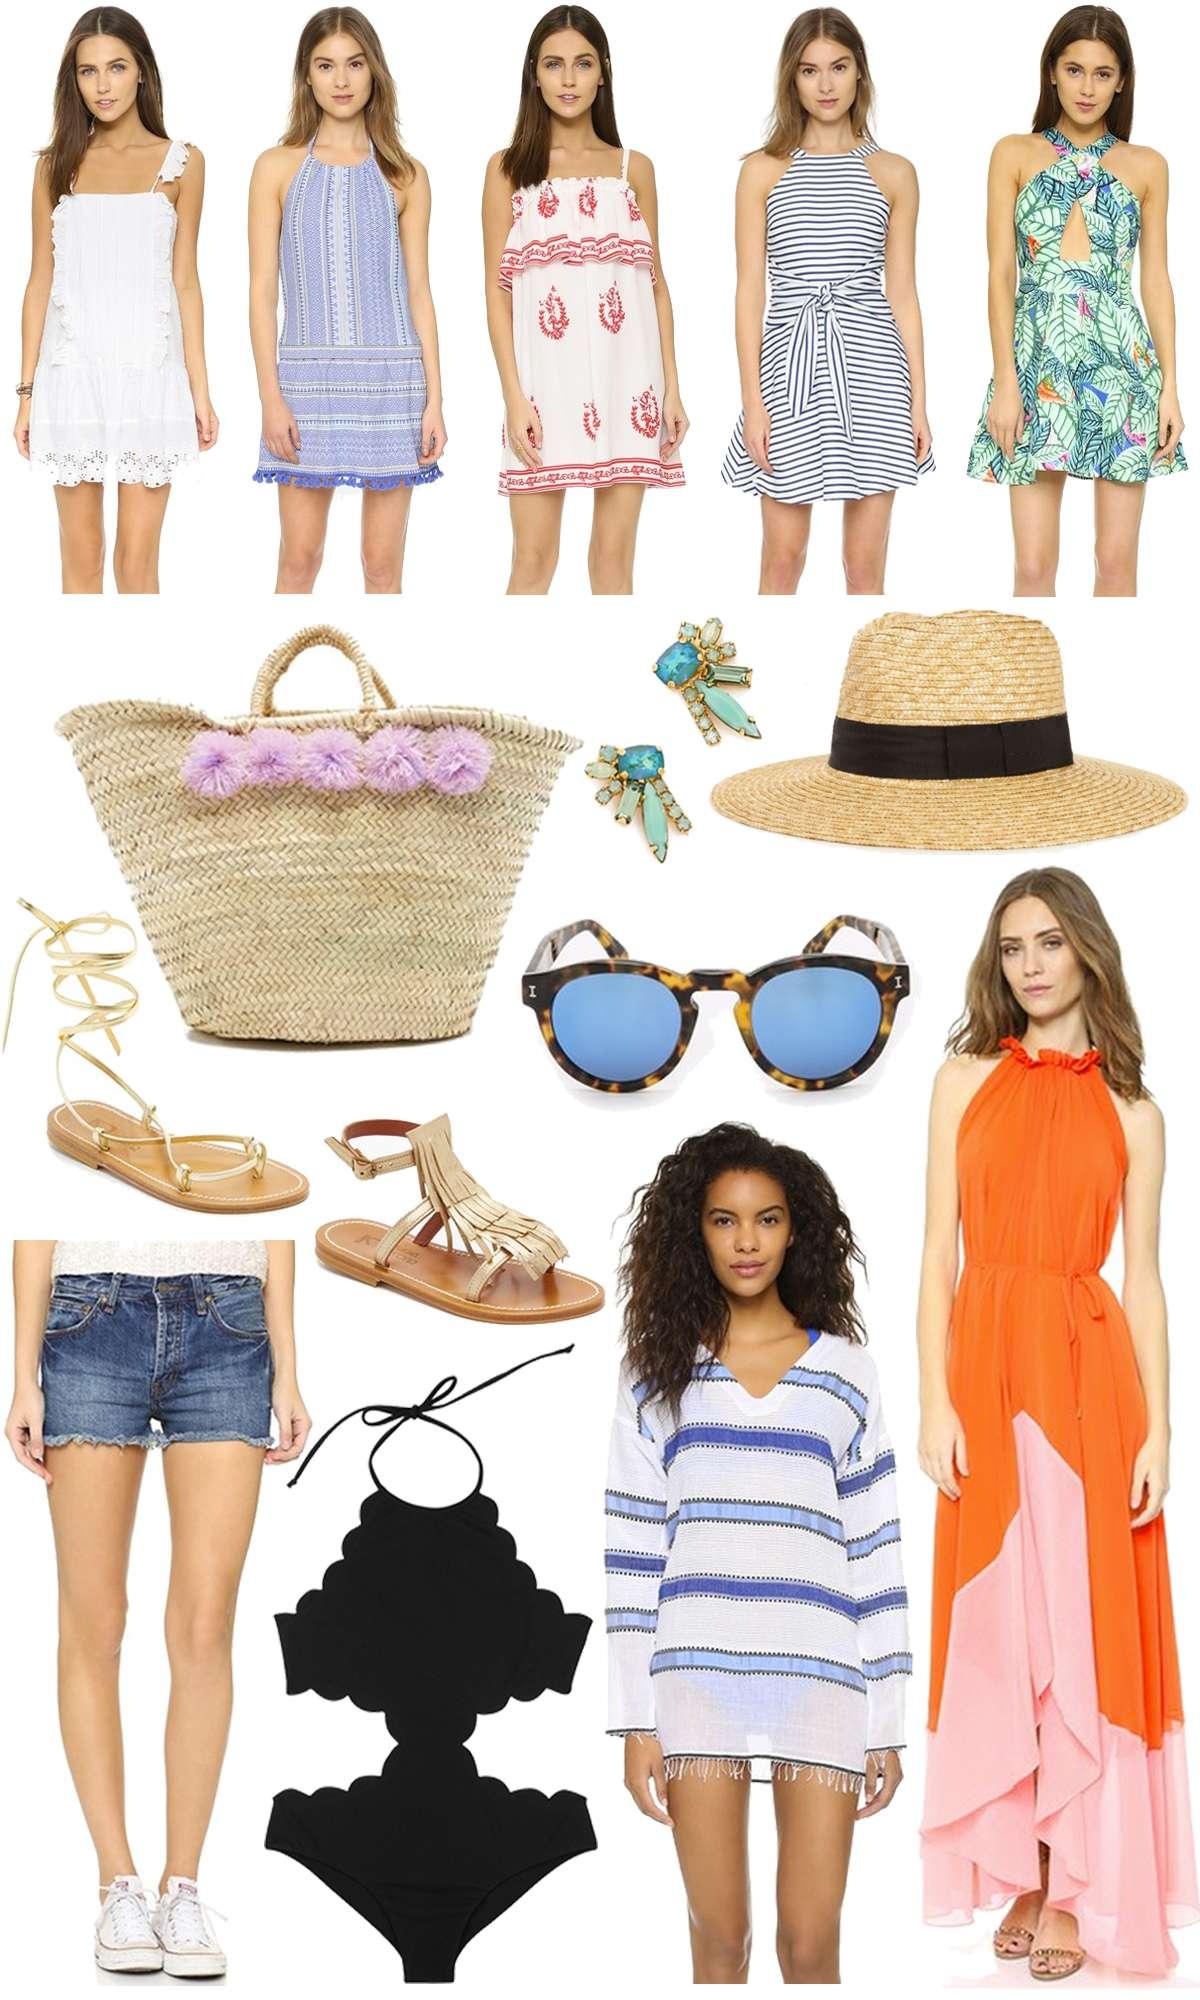 Shopbop Spring Sale: Beach Vacation